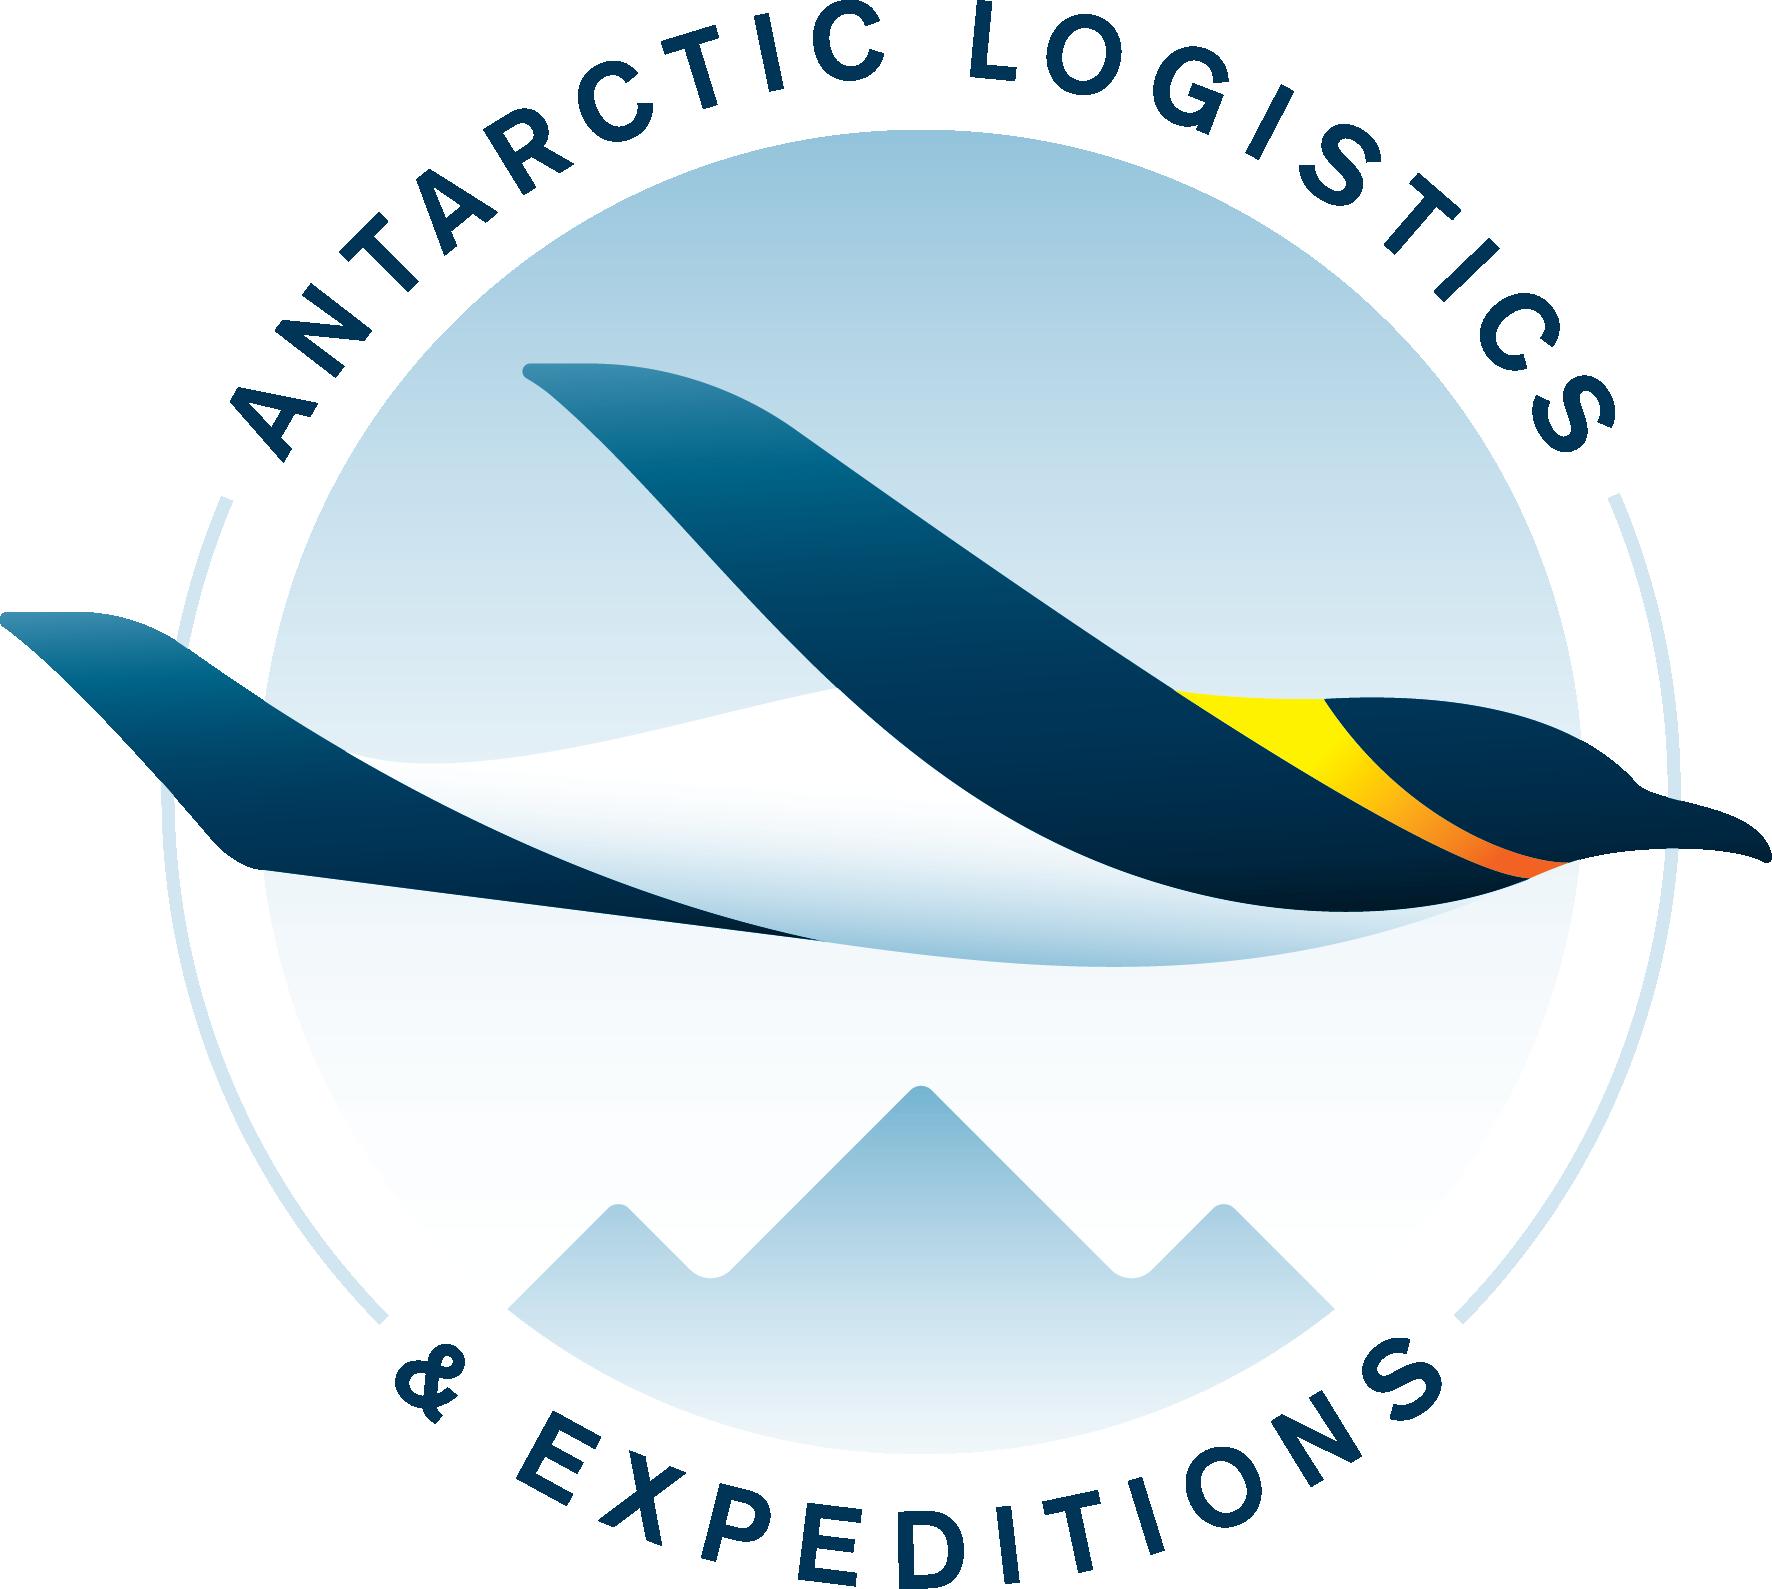 Antarctic Logistics and Expeditions